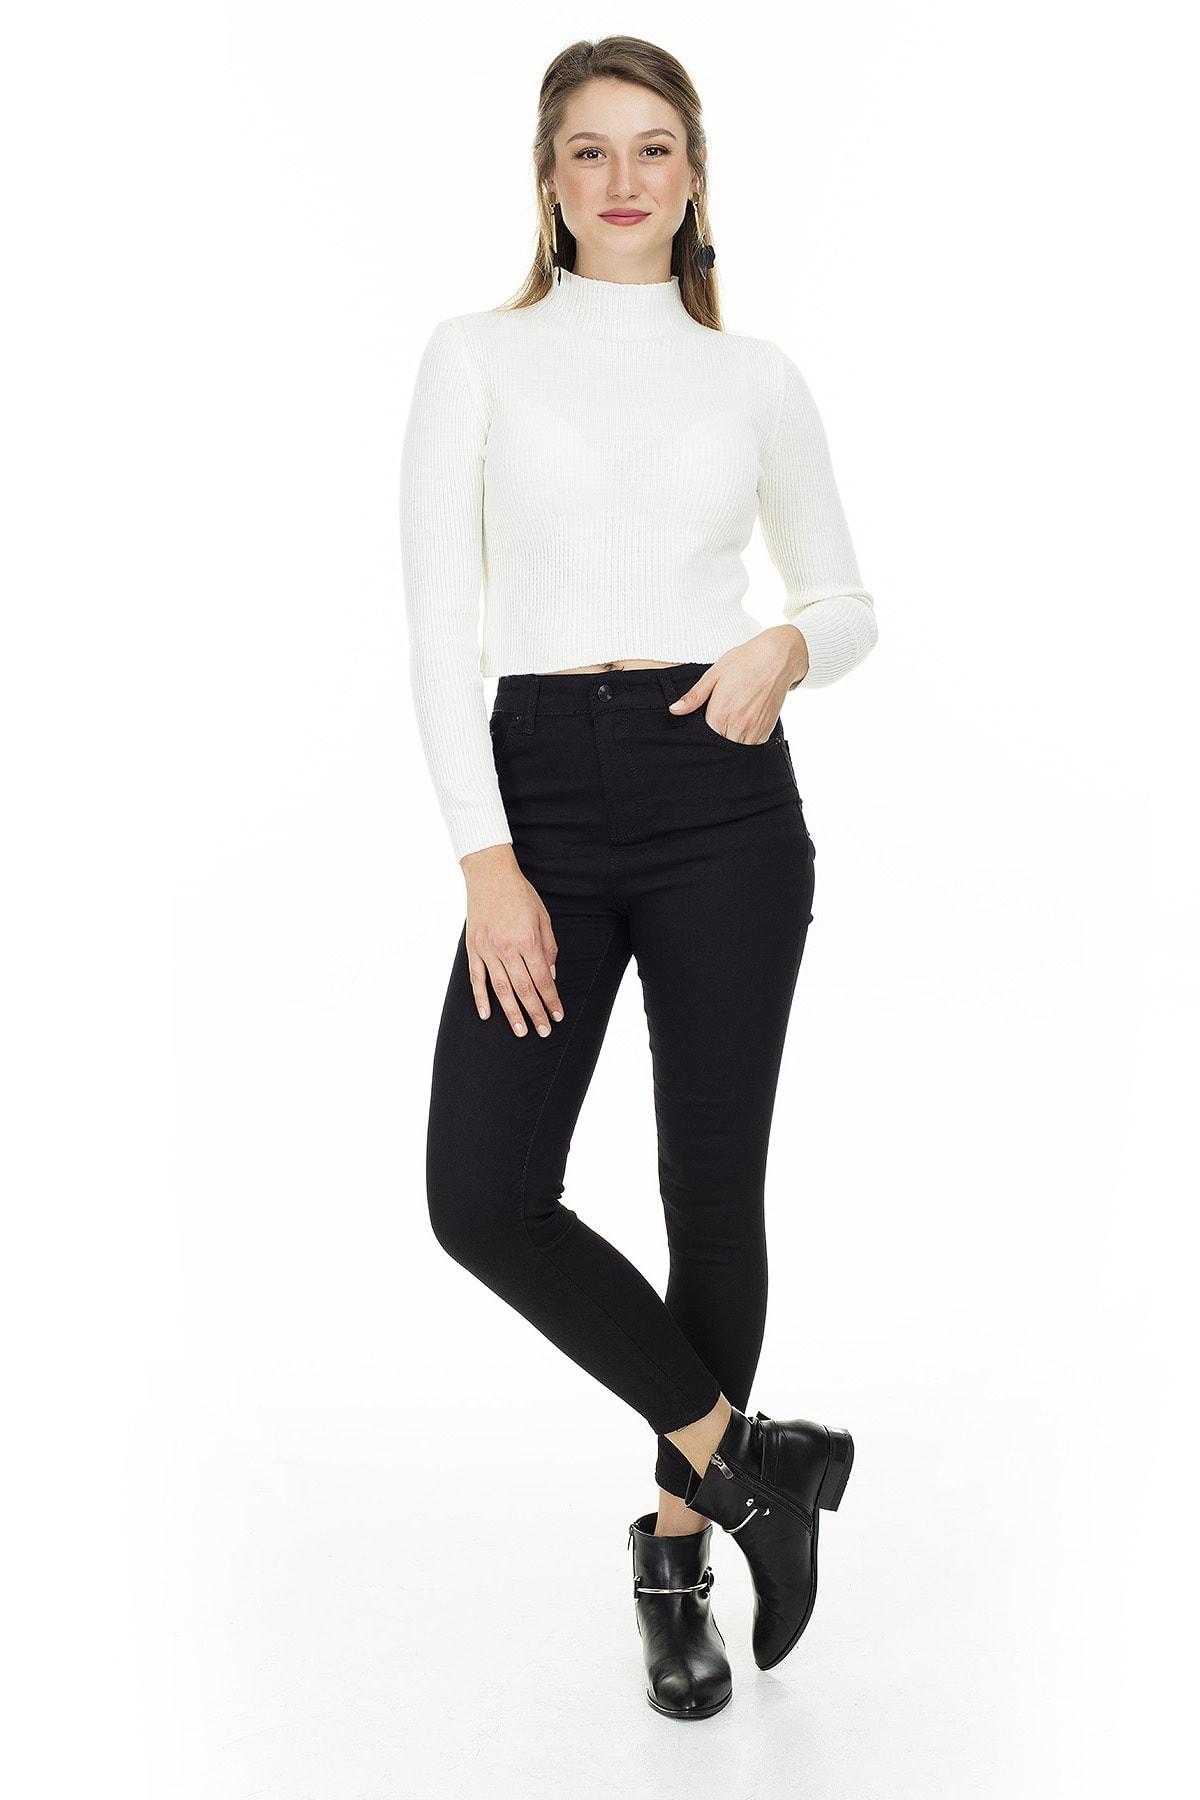 Lela Kadın Yüksek Bel Skinny Jeans Kot Pantolon 5874206